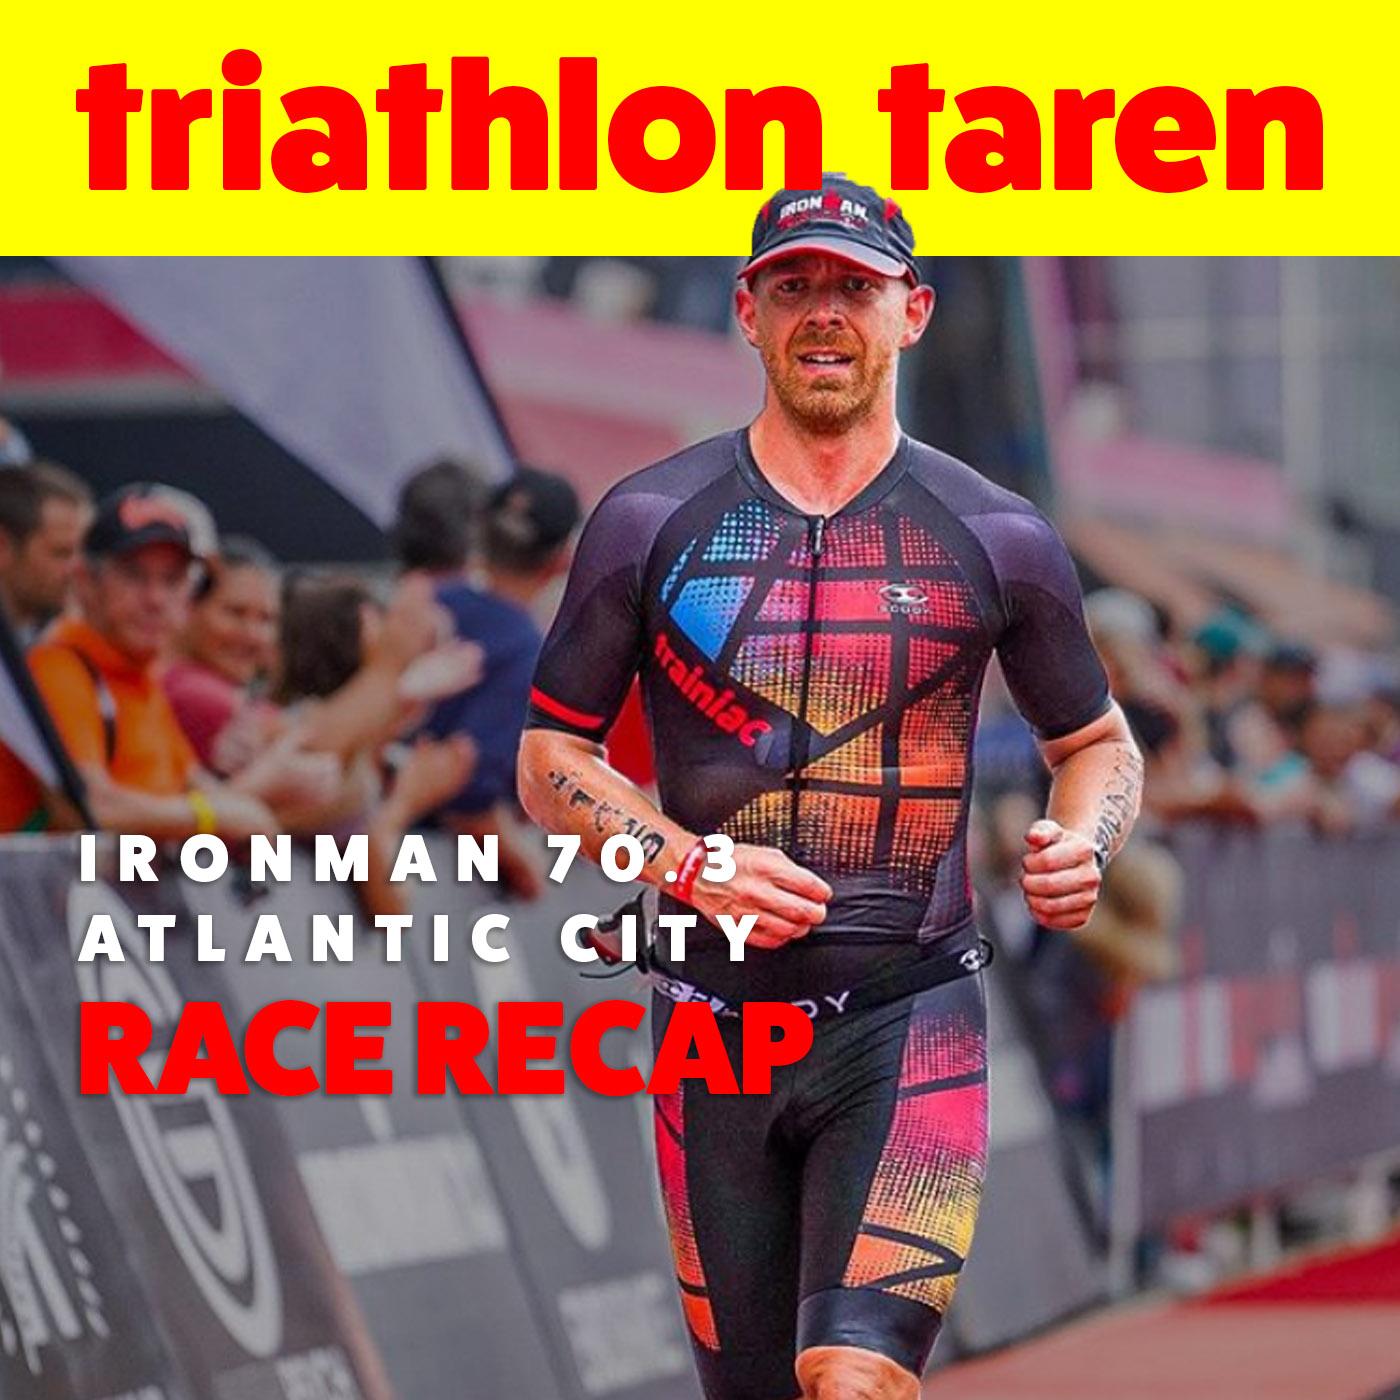 How I PR'ed in Chaos: Atlantic City 70.3 Half-Ironman Race Recap